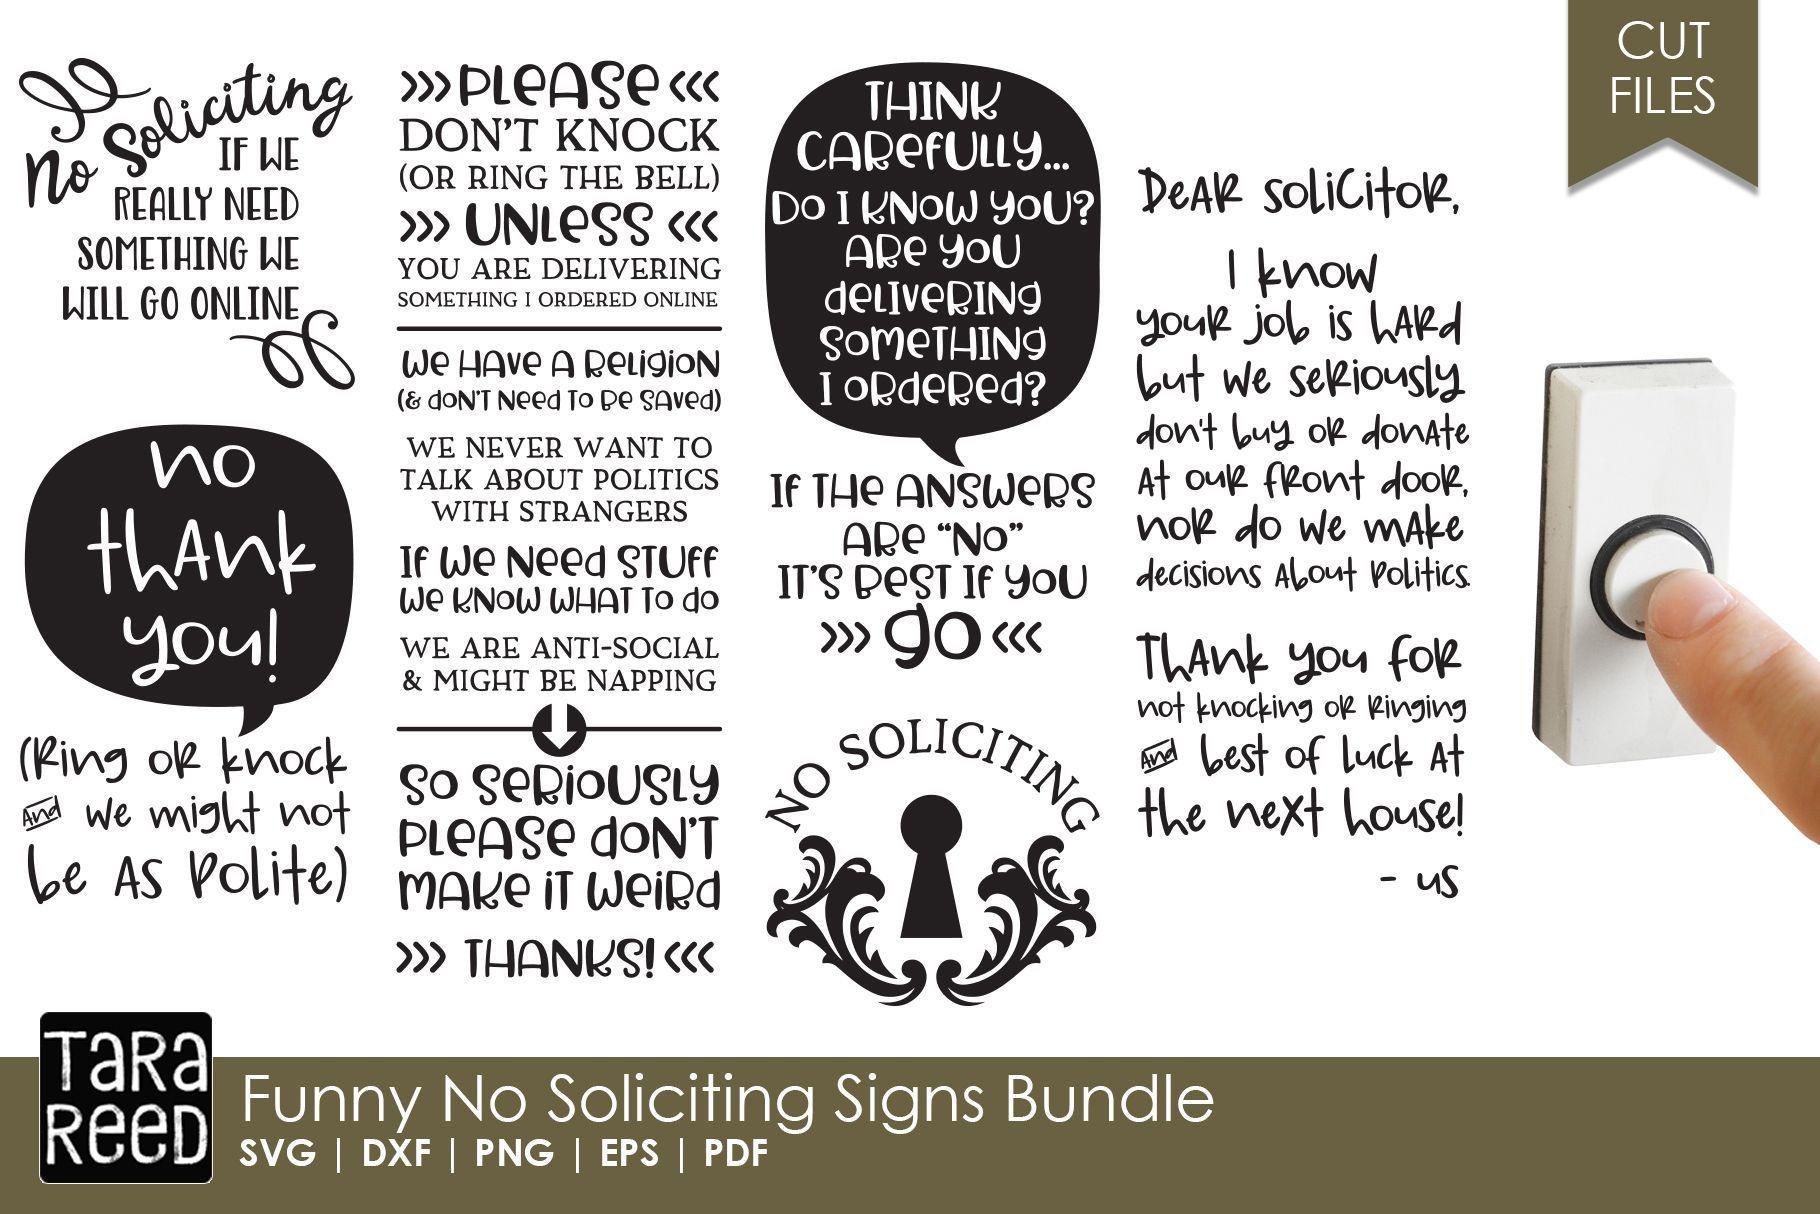 Funny No Soliciting Sign Bundle (132797) | Cut Files | Design Bundles